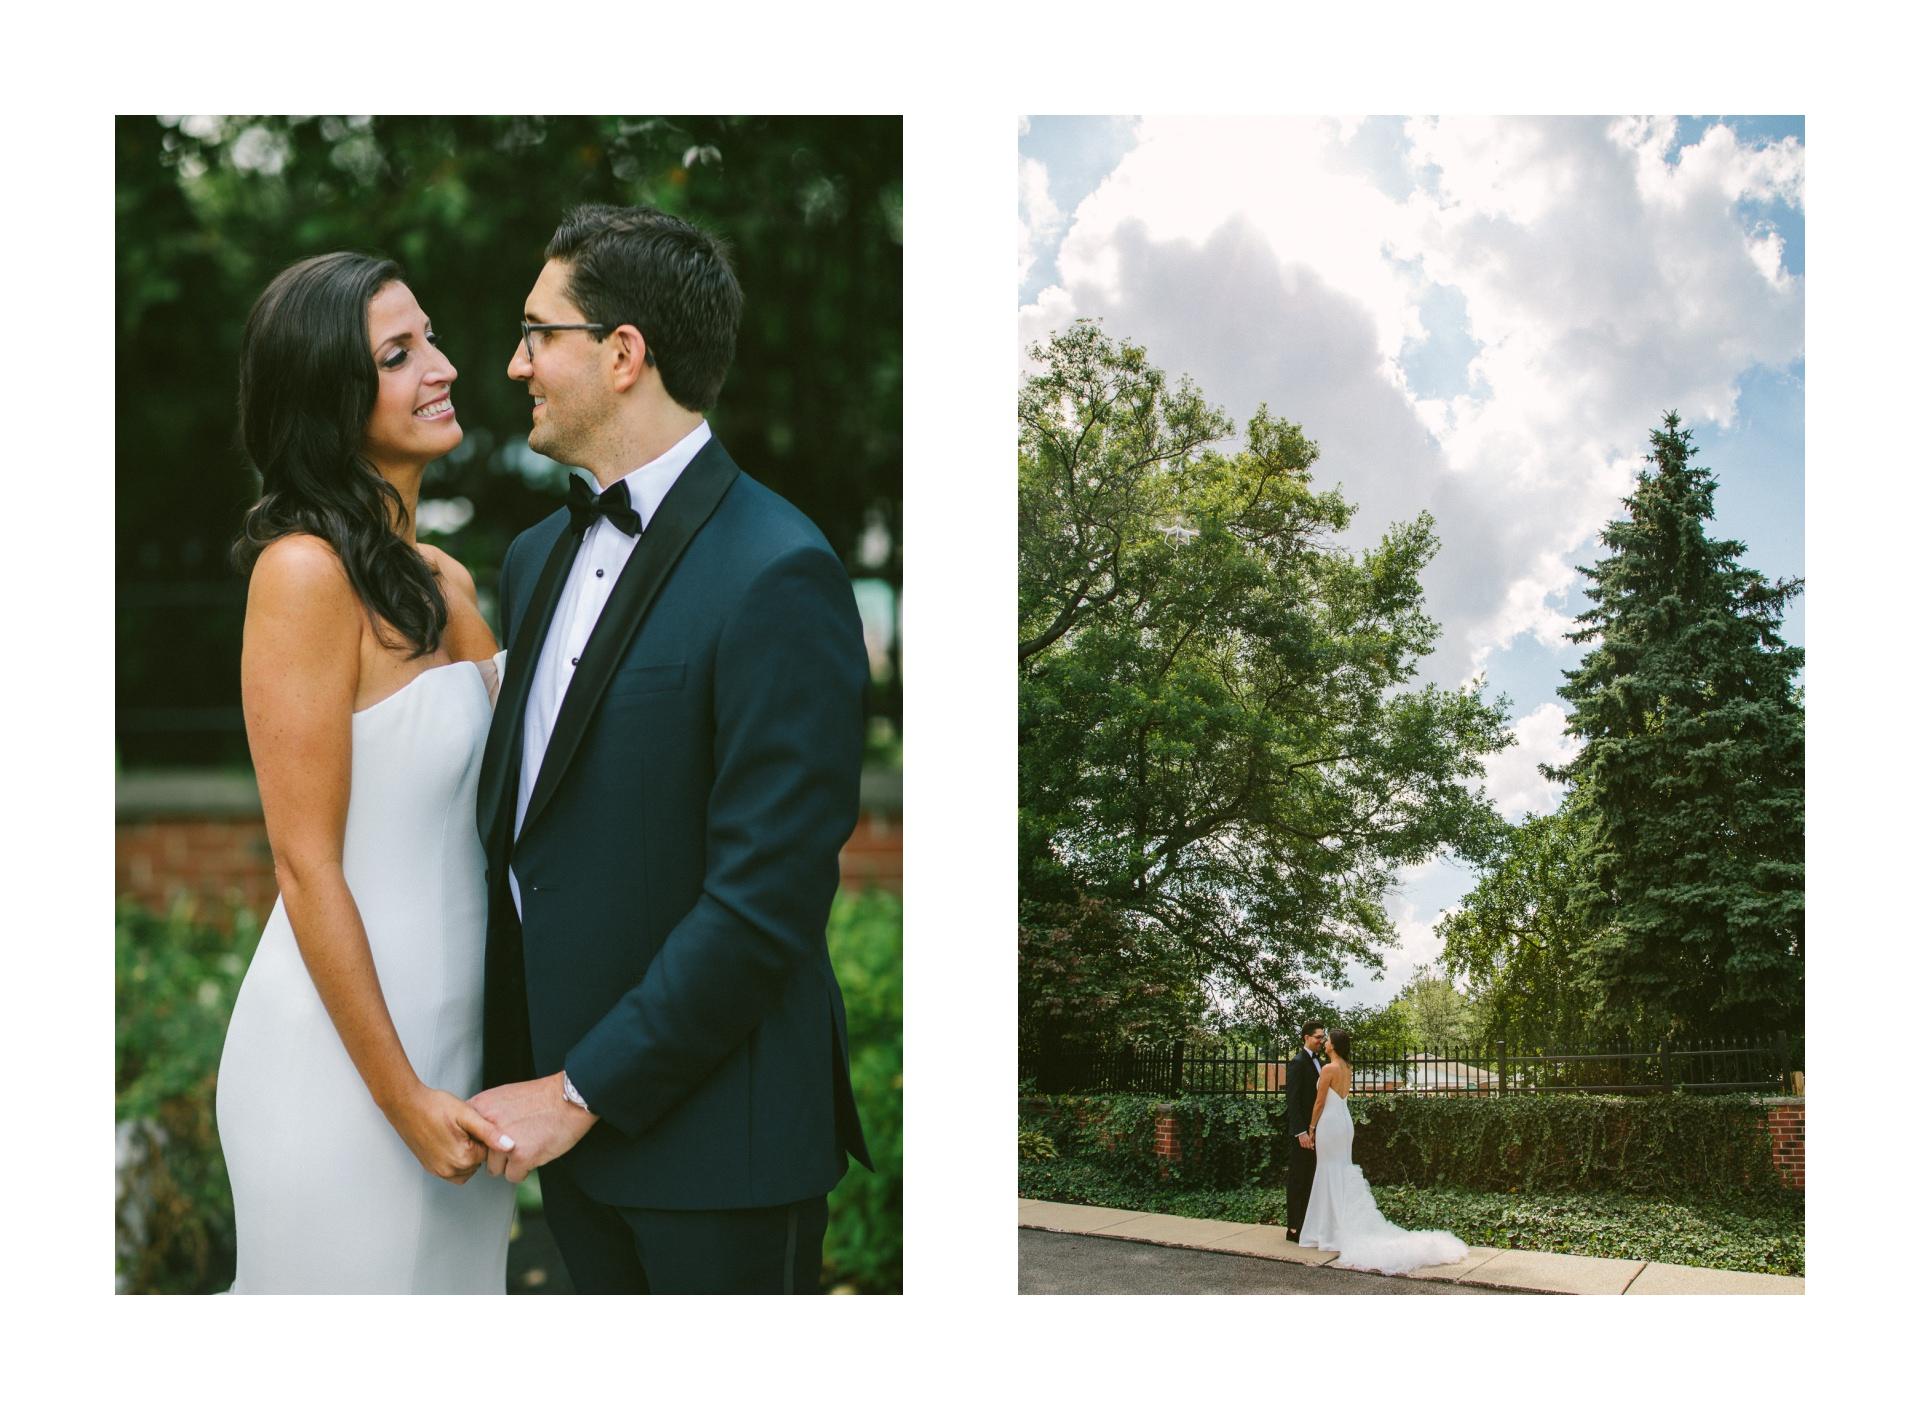 Beechmont Country Club Wedding Photographer in Beachwood 1 31.jpg